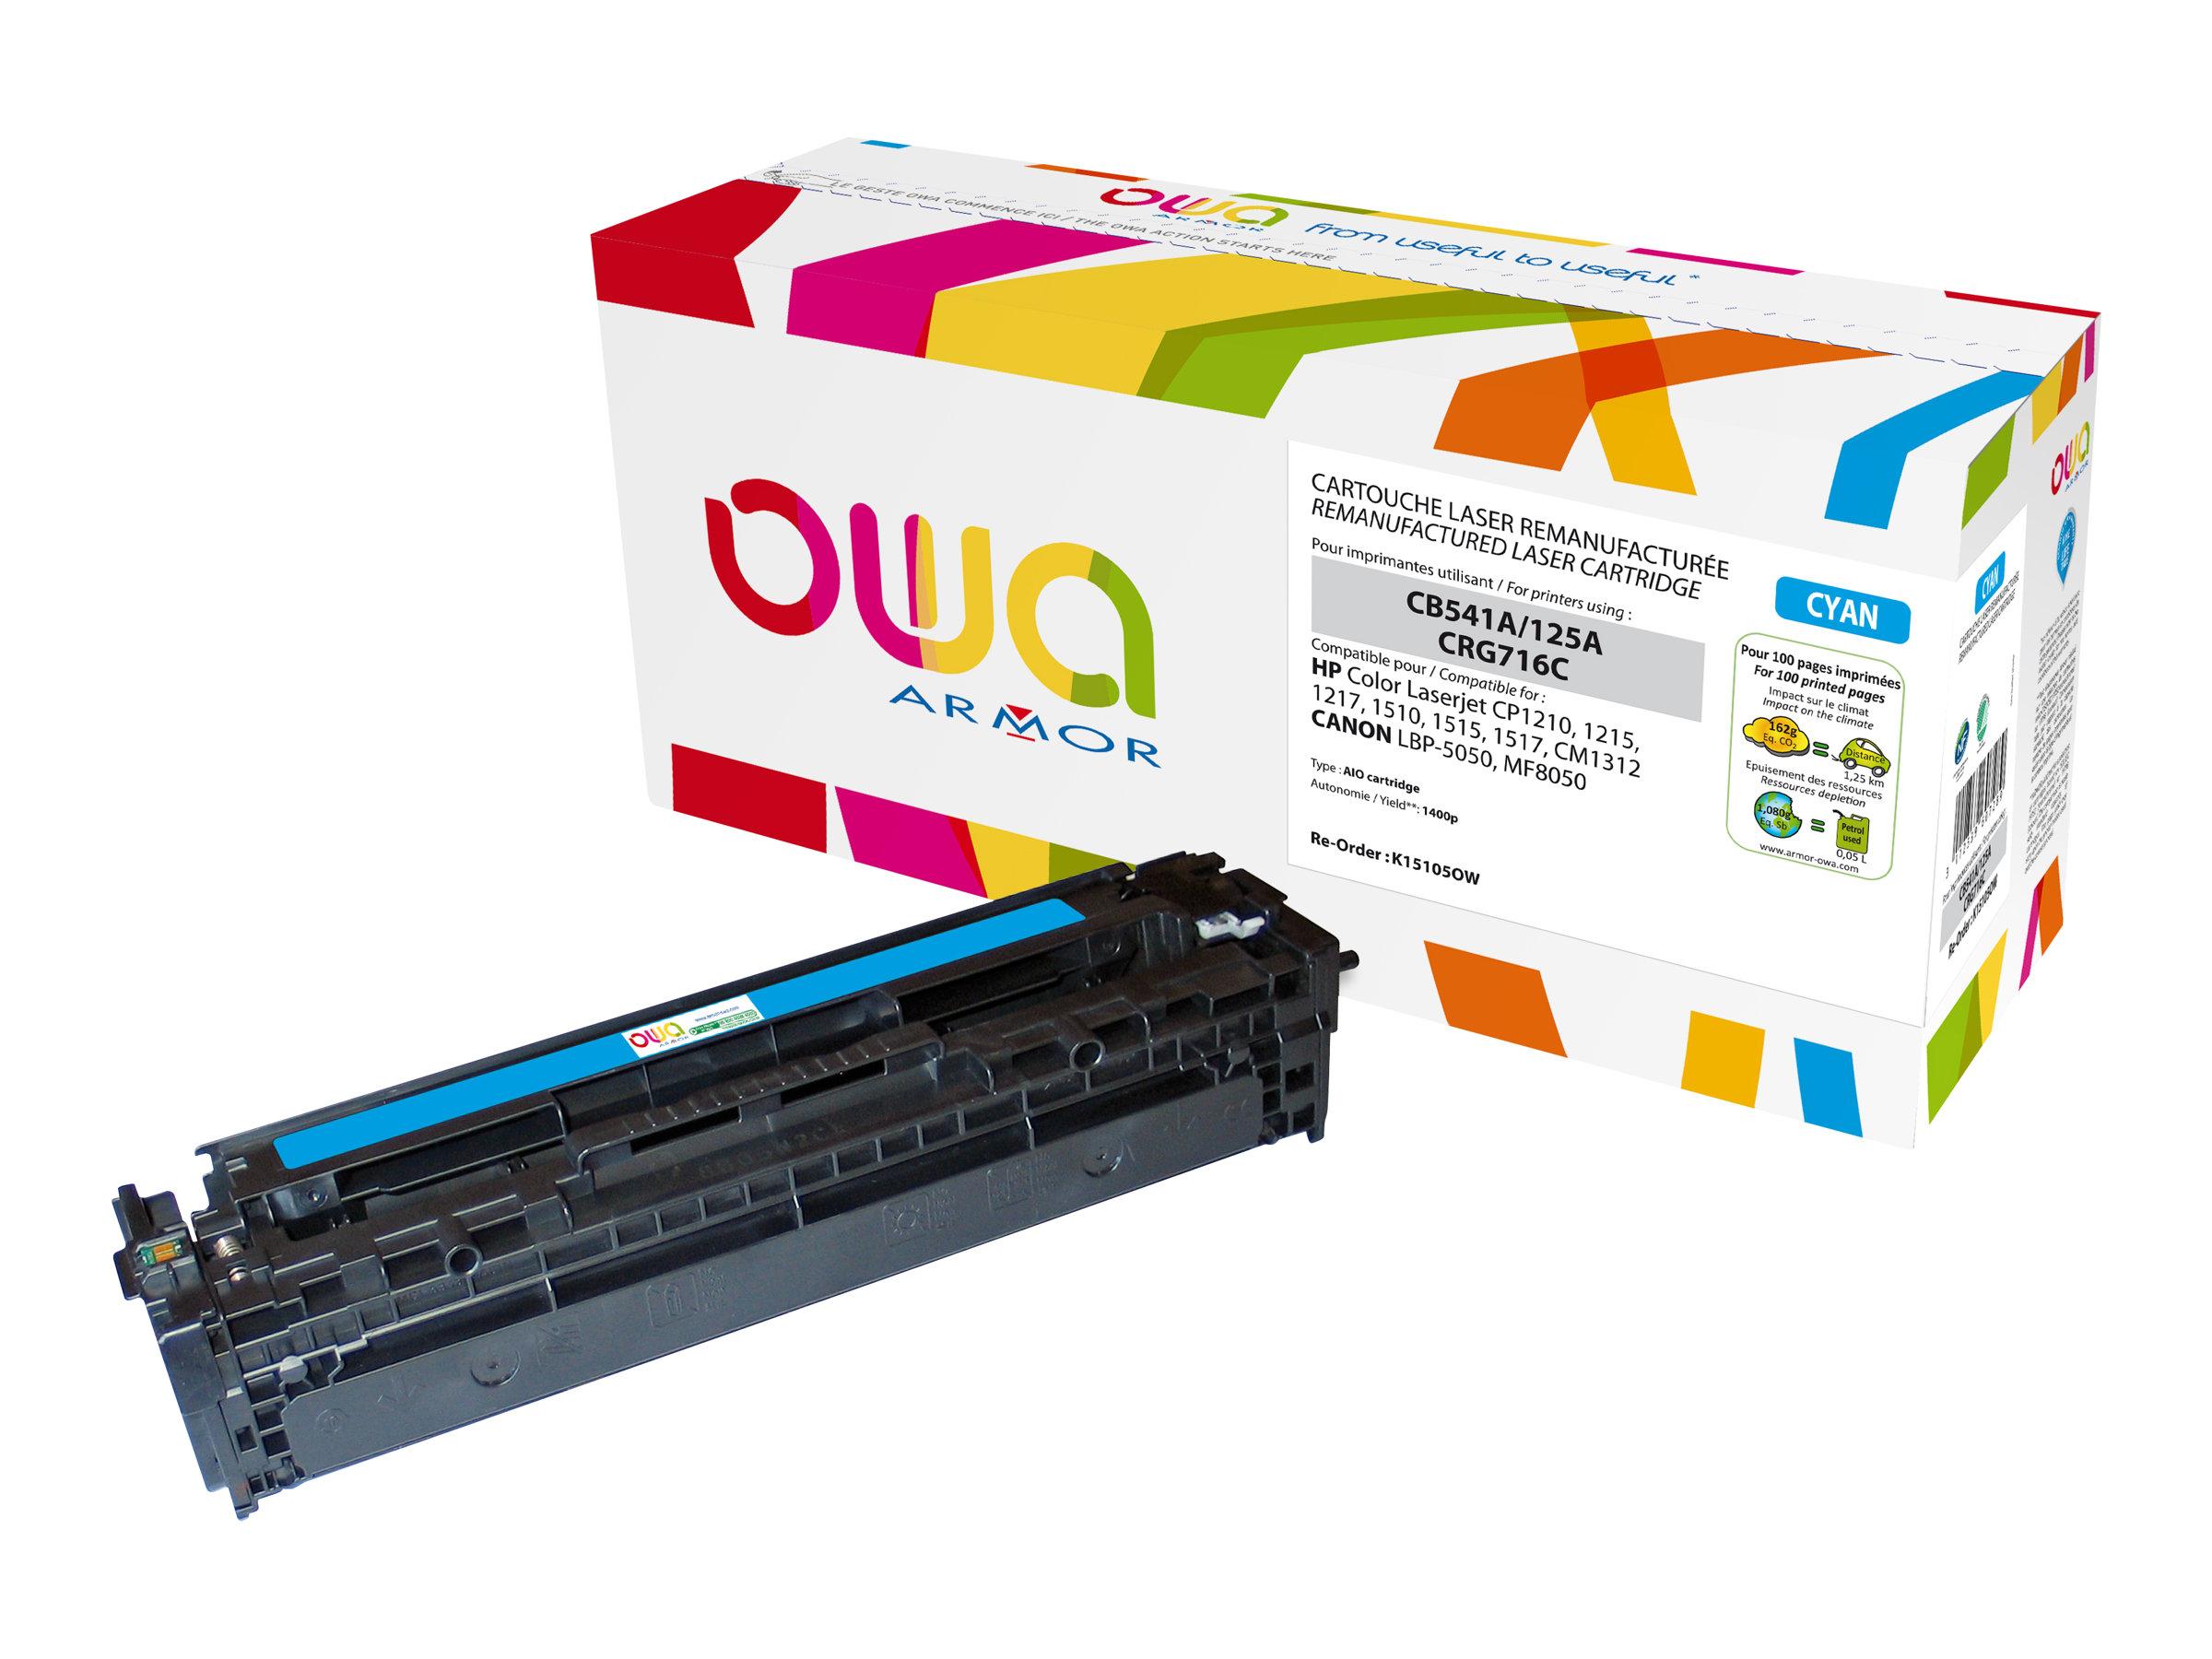 Owa K15105OW cartouche équivalente HP 125A - cyan